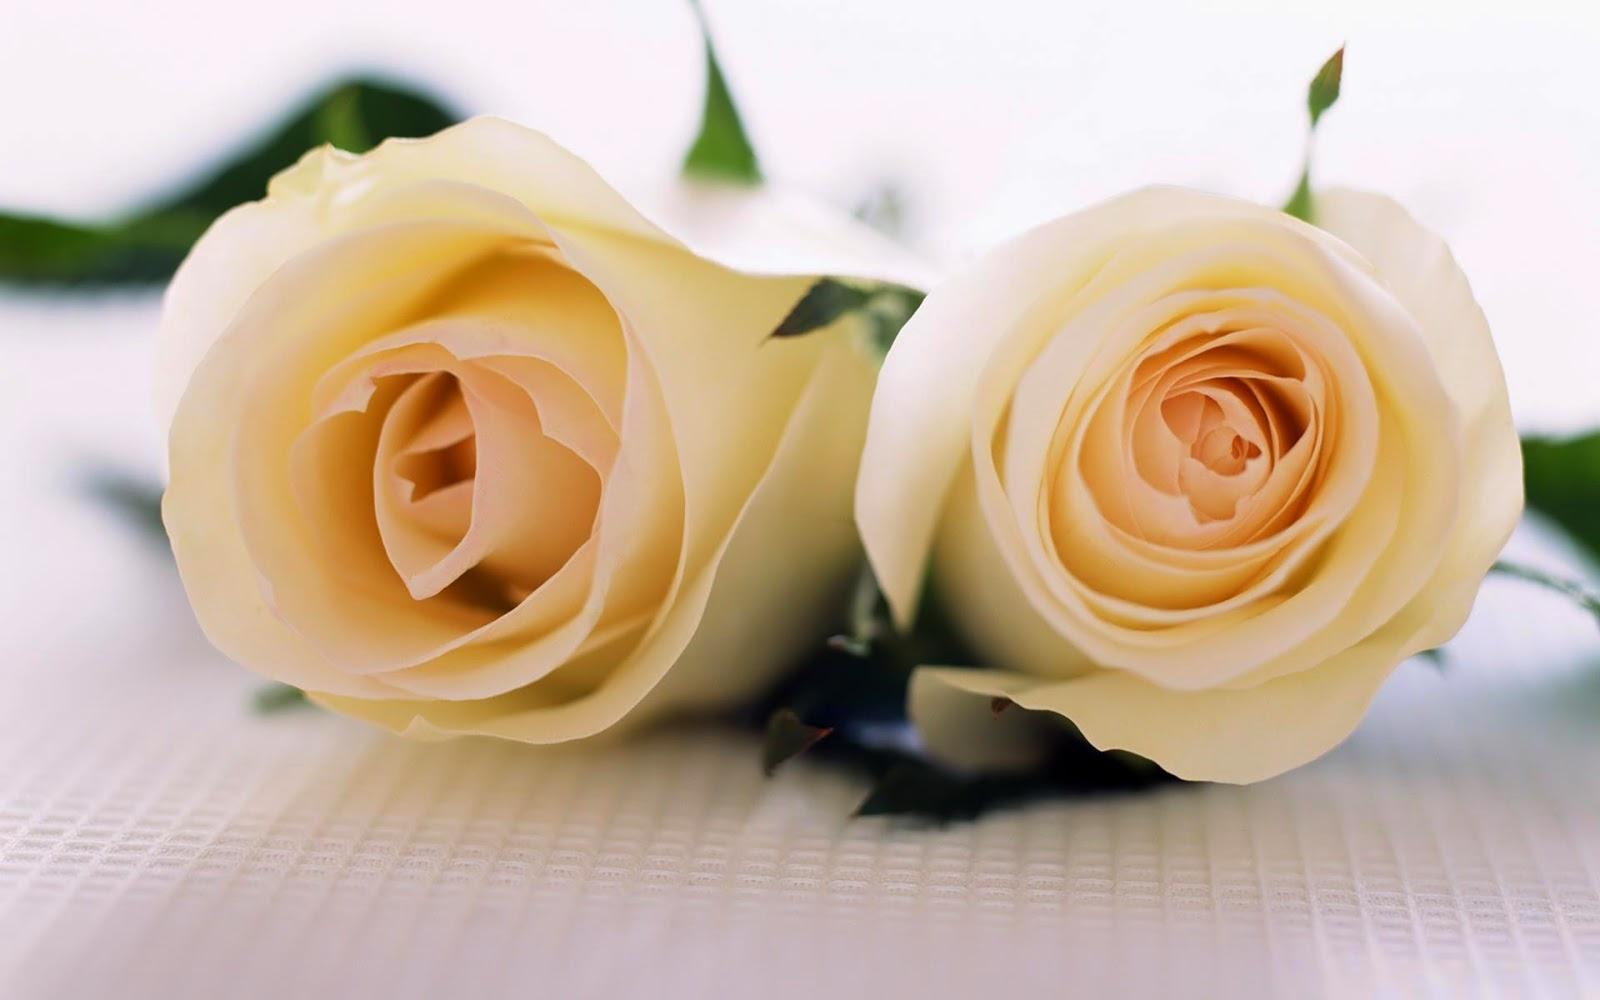 Hd wallpapers beautiful flowers for a beautiful girl izmirmasajfo